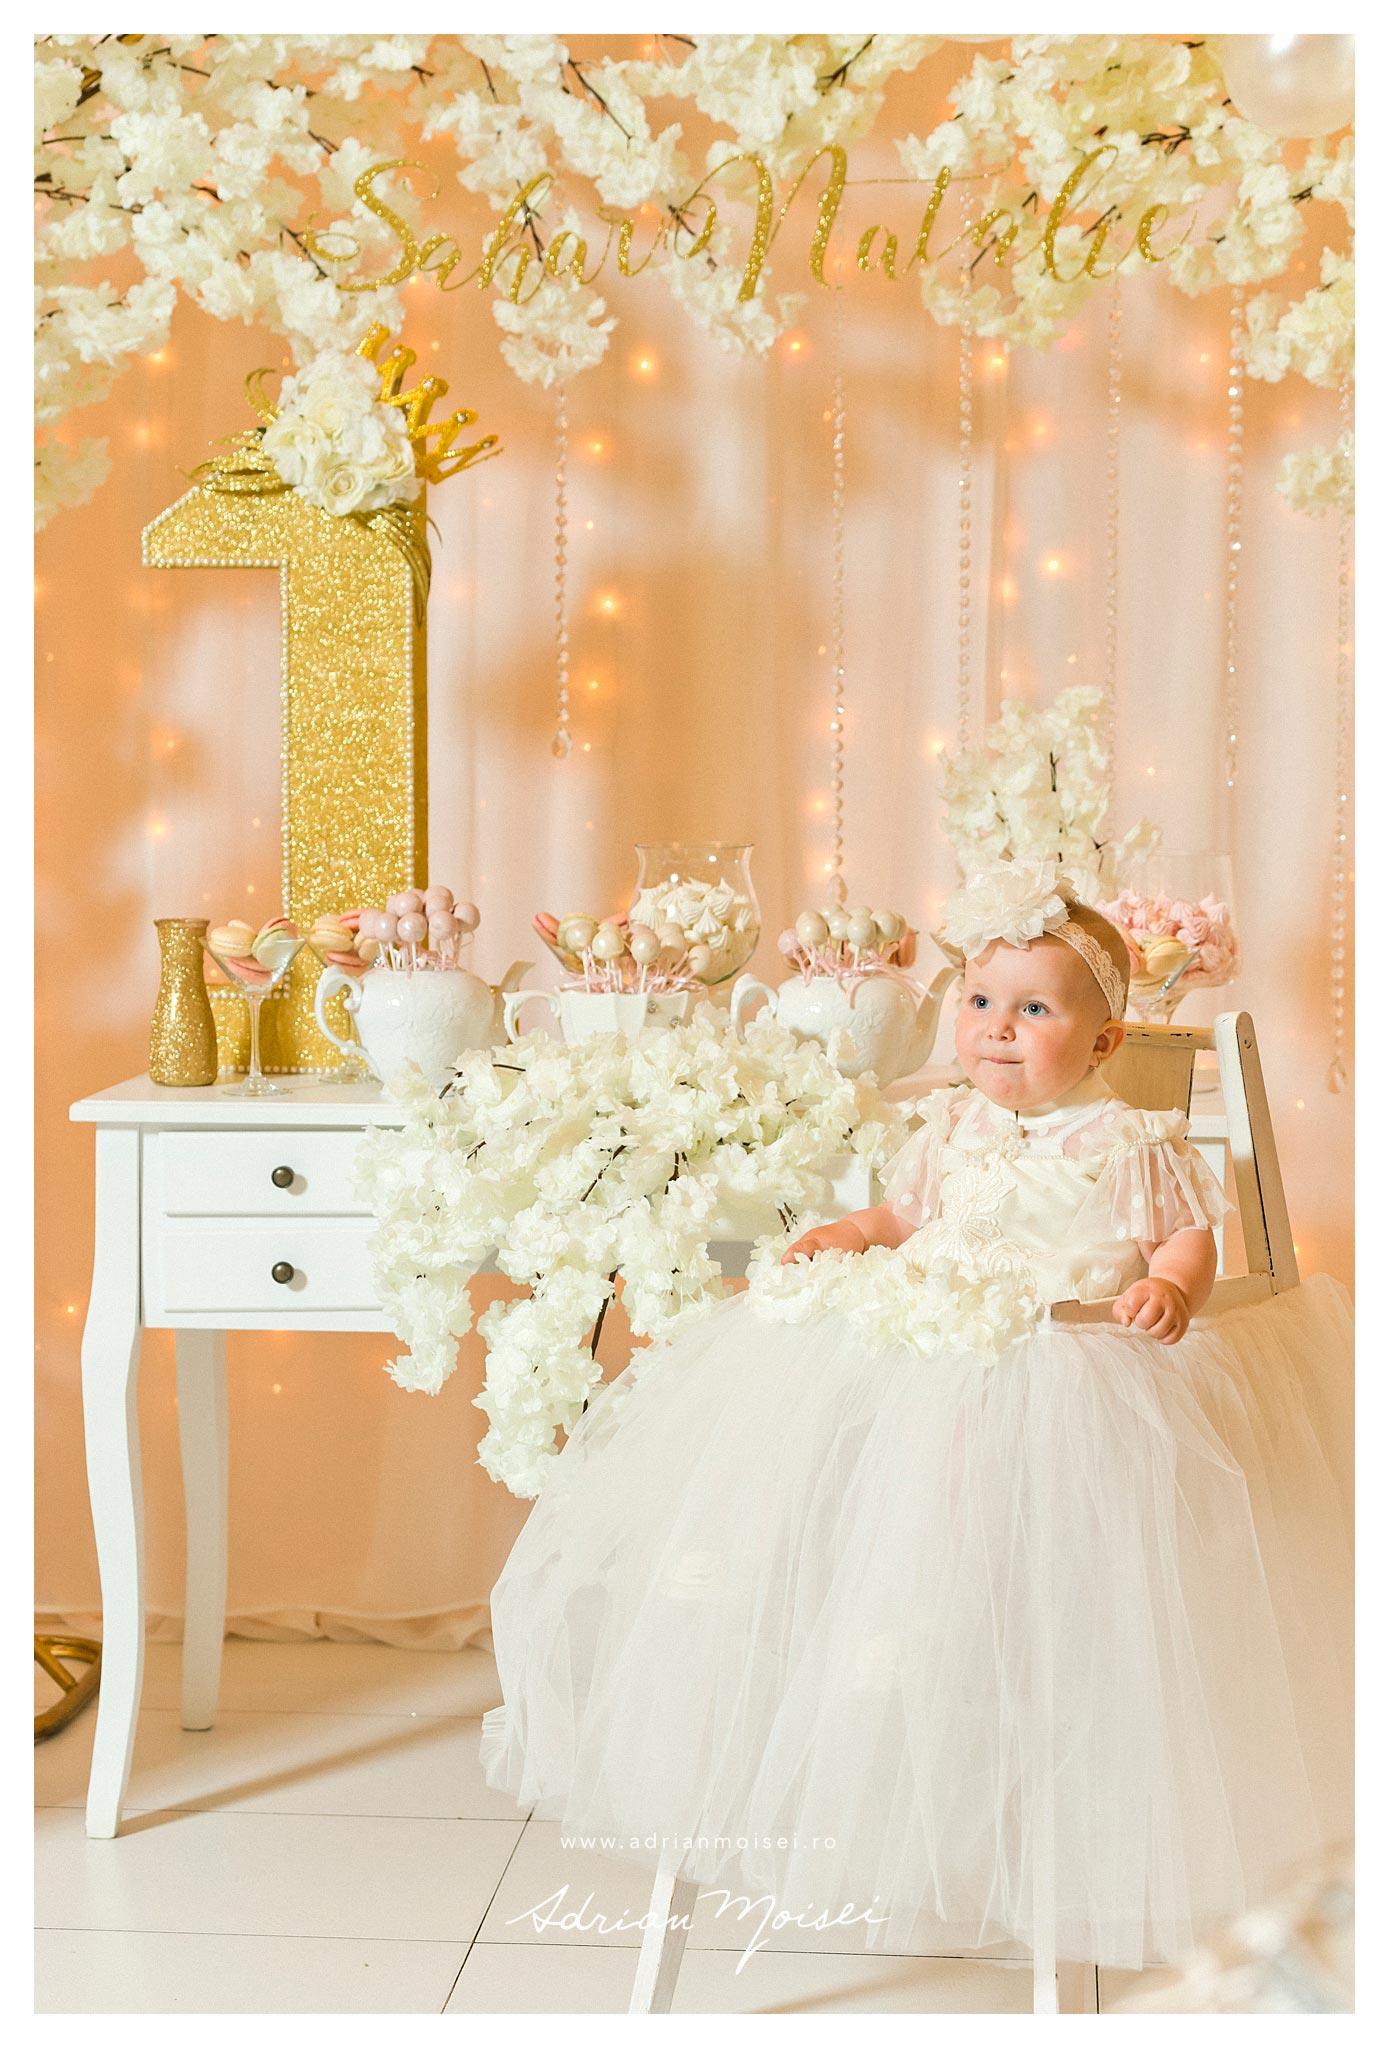 Portret de copil la petrecerea de 1 an, fetita in rochita de printesa, fotograf botez Iasi Adrian Moisei